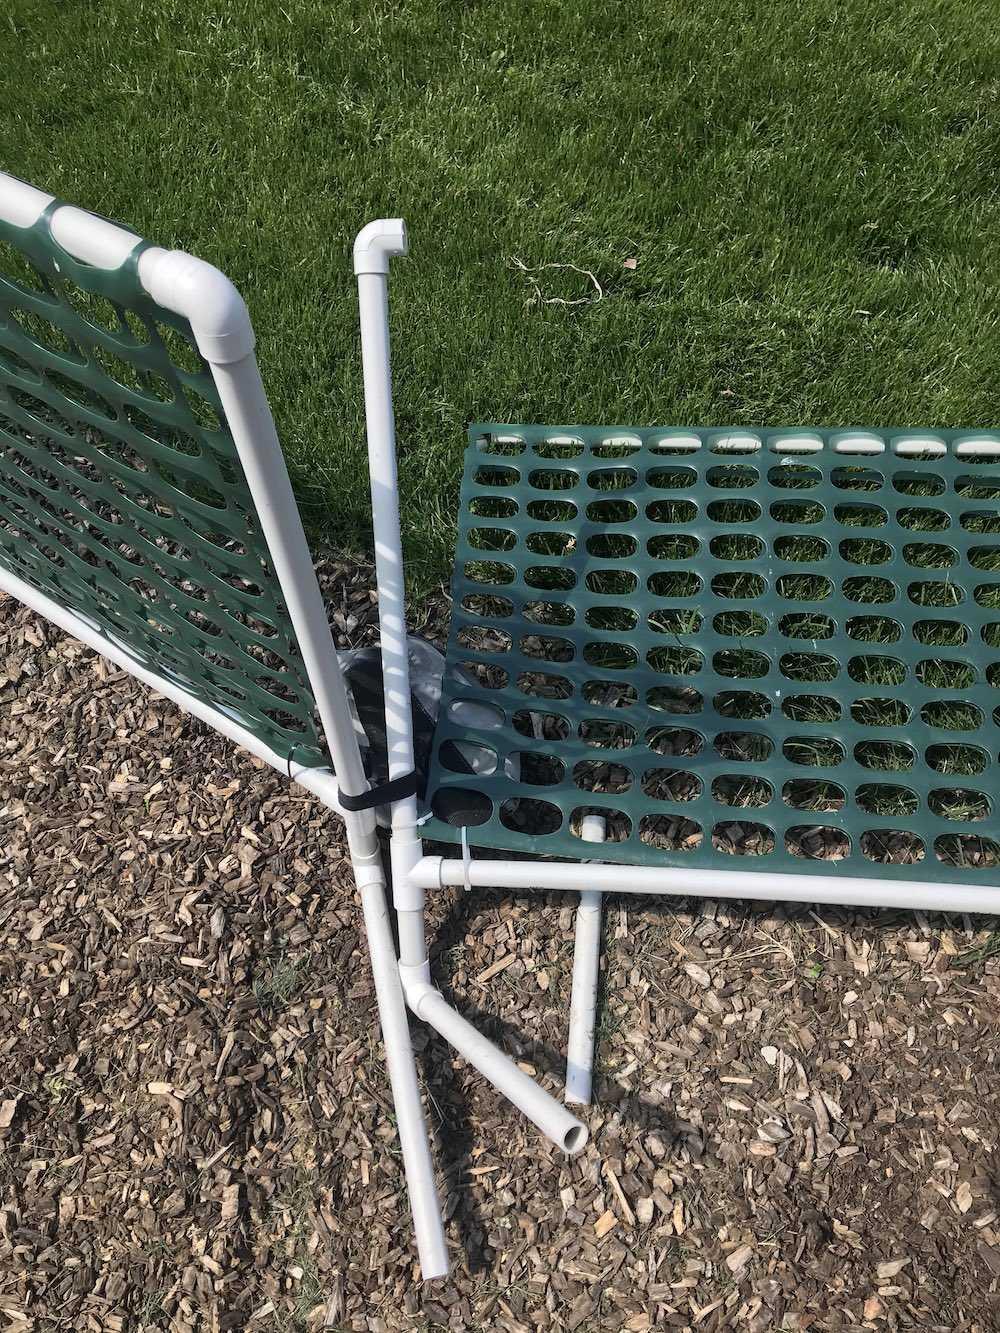 Unglued PVC Ring Gate Pulled Apart